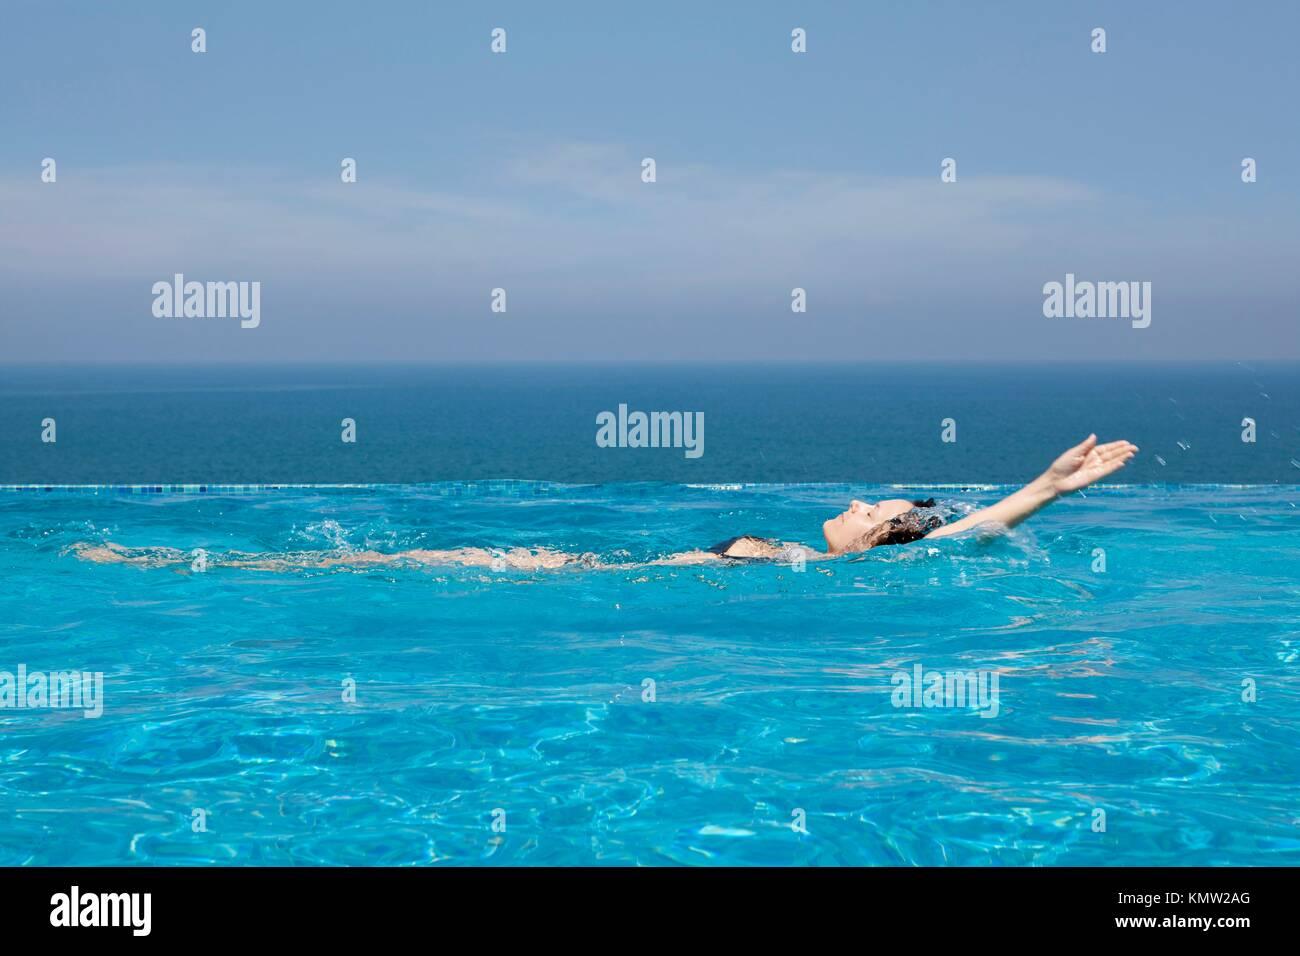 splendid swimming pool in a hotel resort in Kerala state india Stock Photo